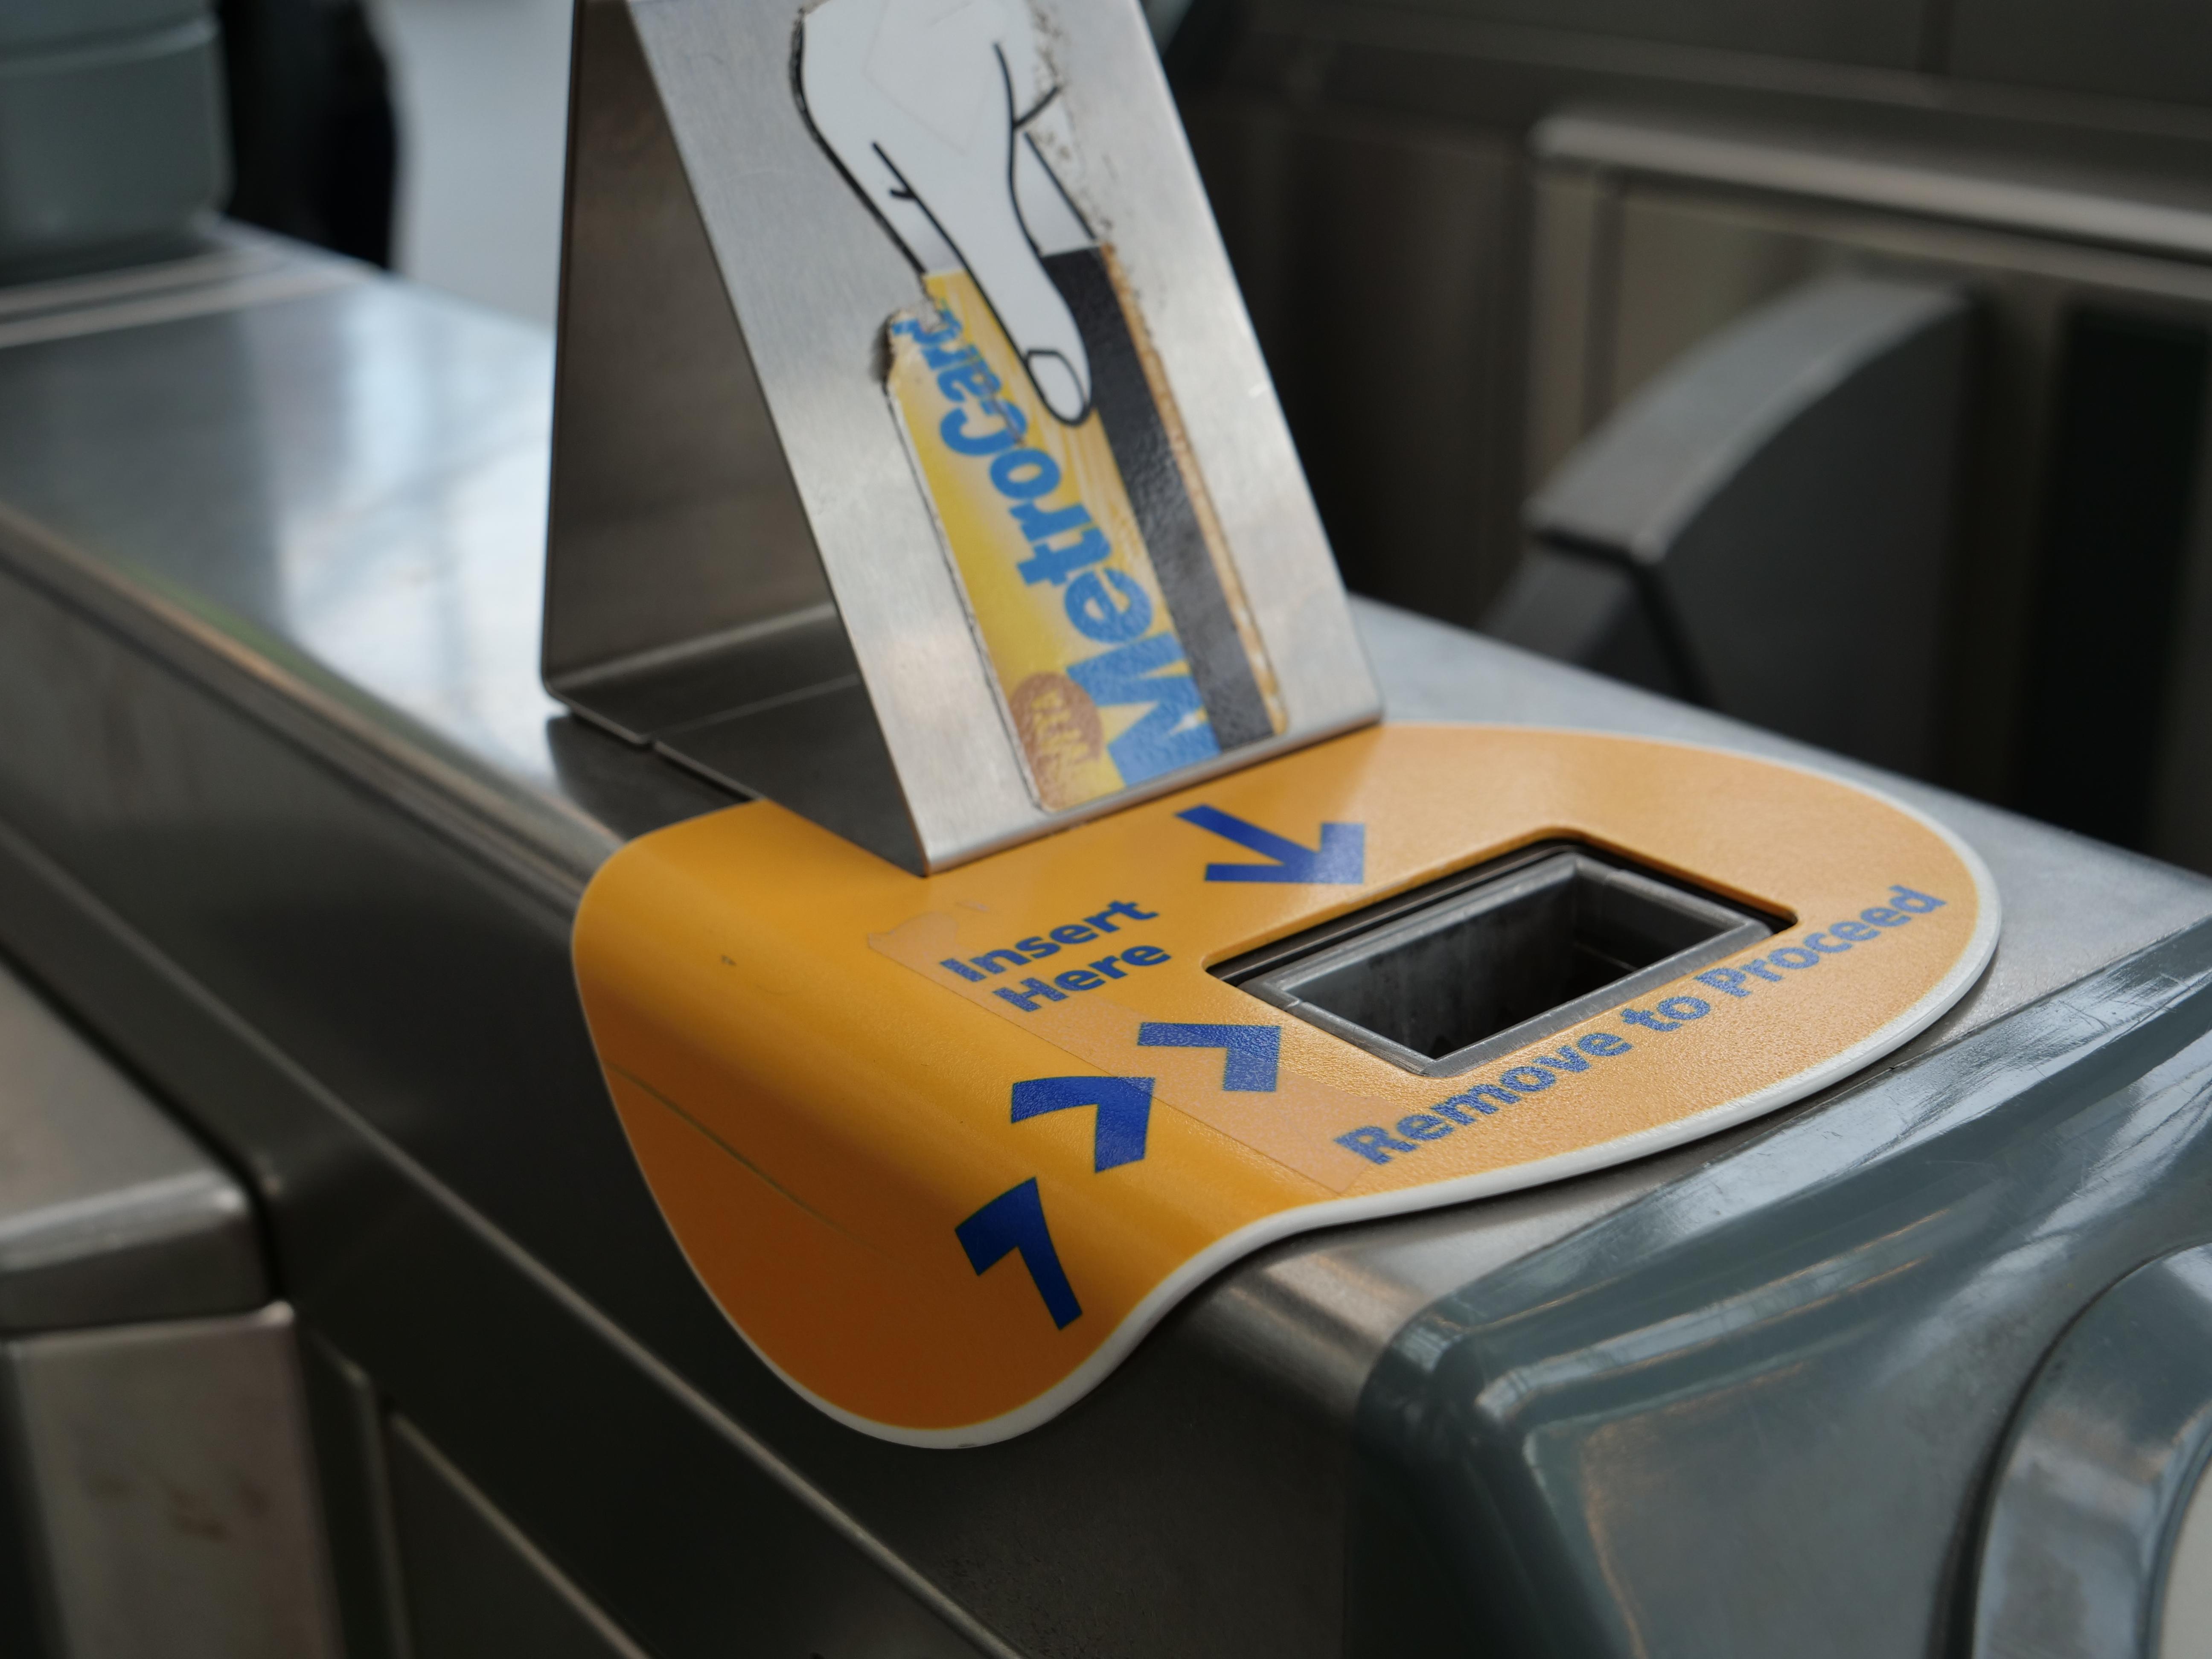 JFK NYC airtrain metrocard subway